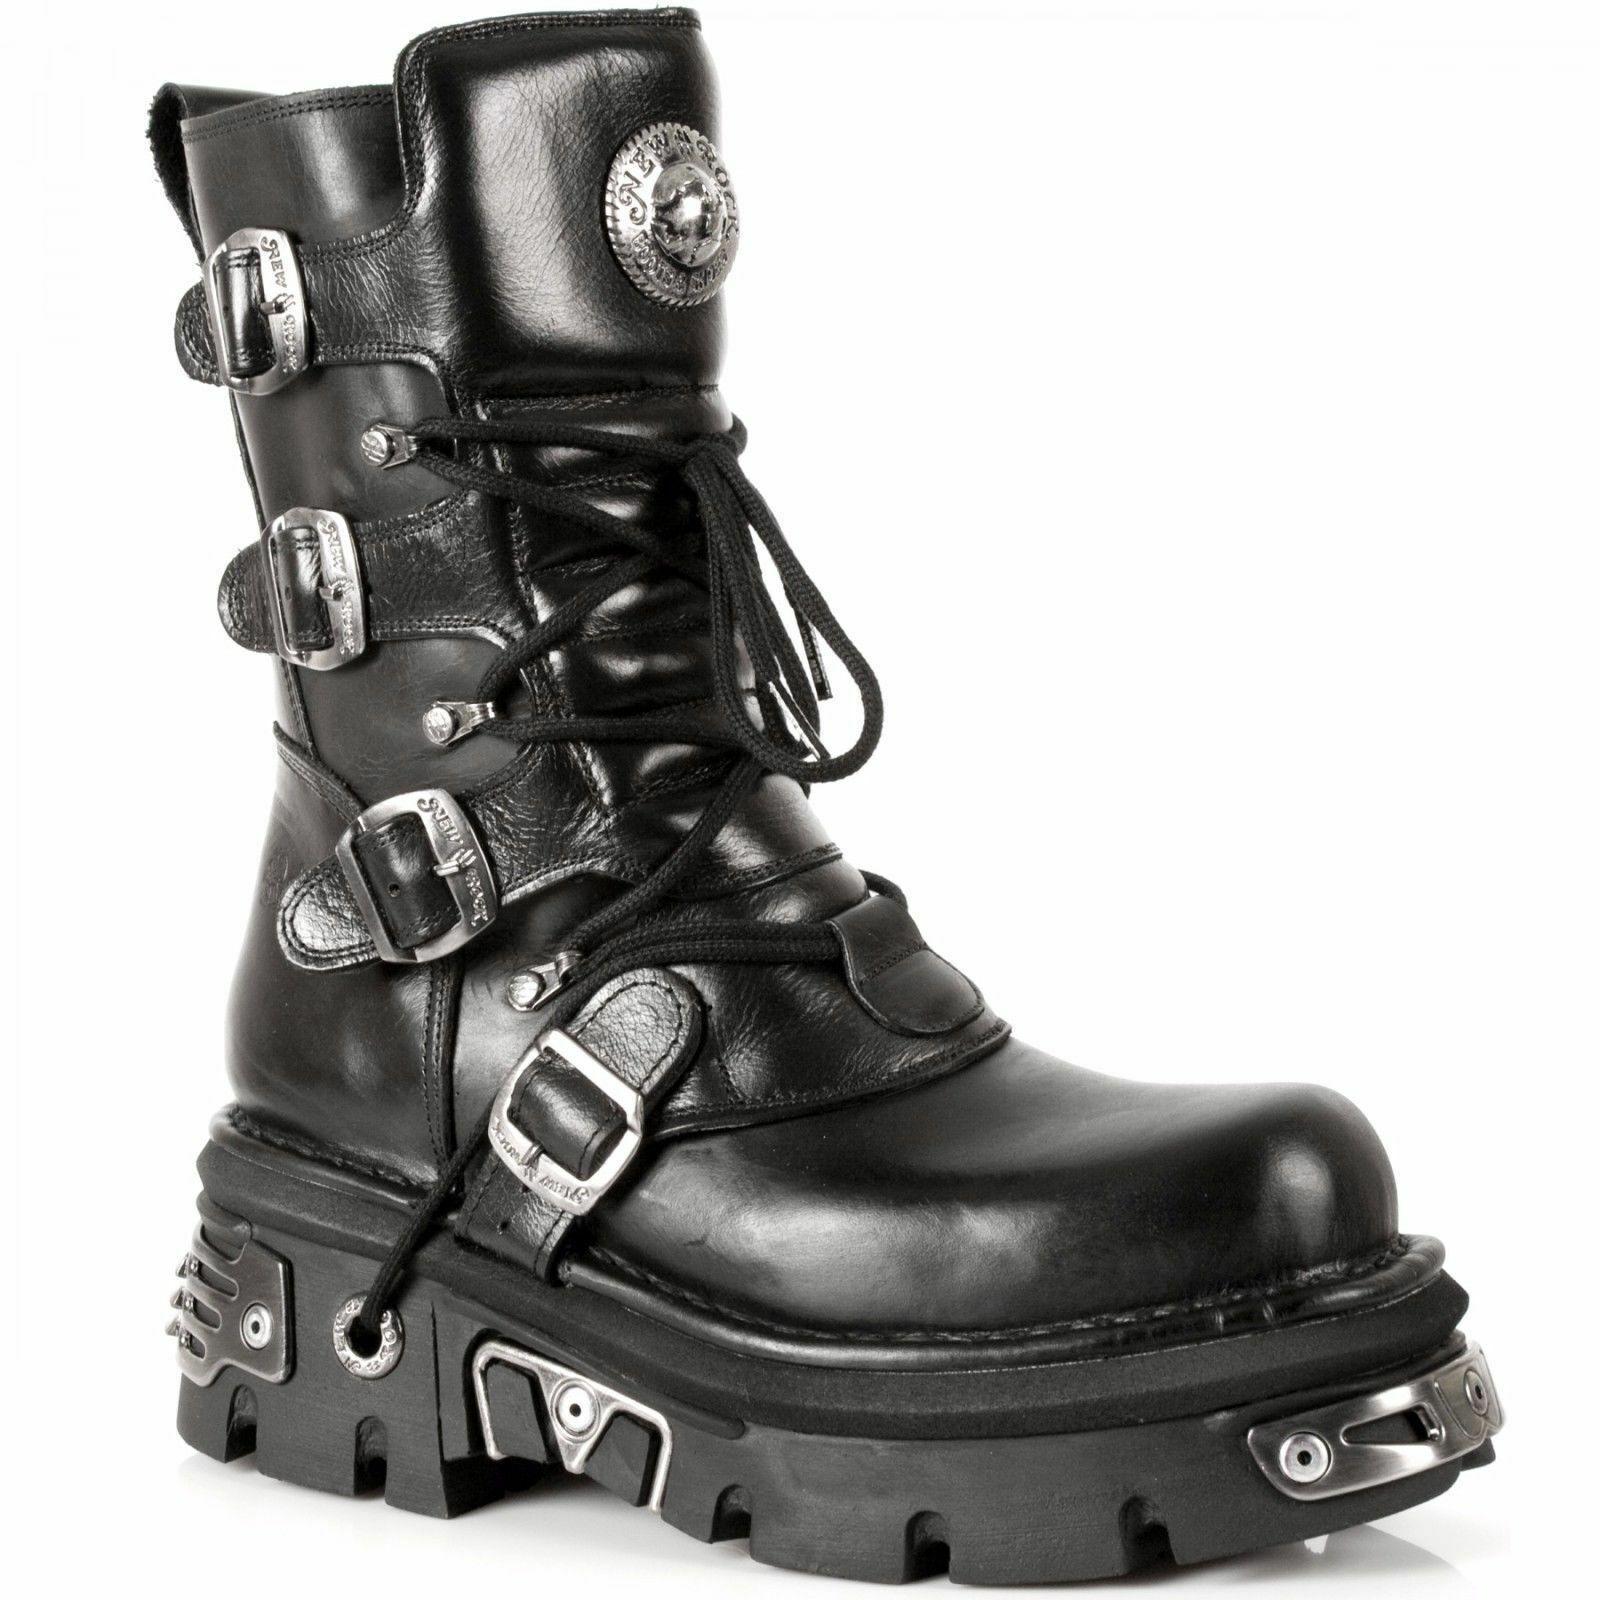 NEWROCK Homme Cuir NEW ROCK 373-S4 noir métallisé Goth Emo Punk Biker bottes